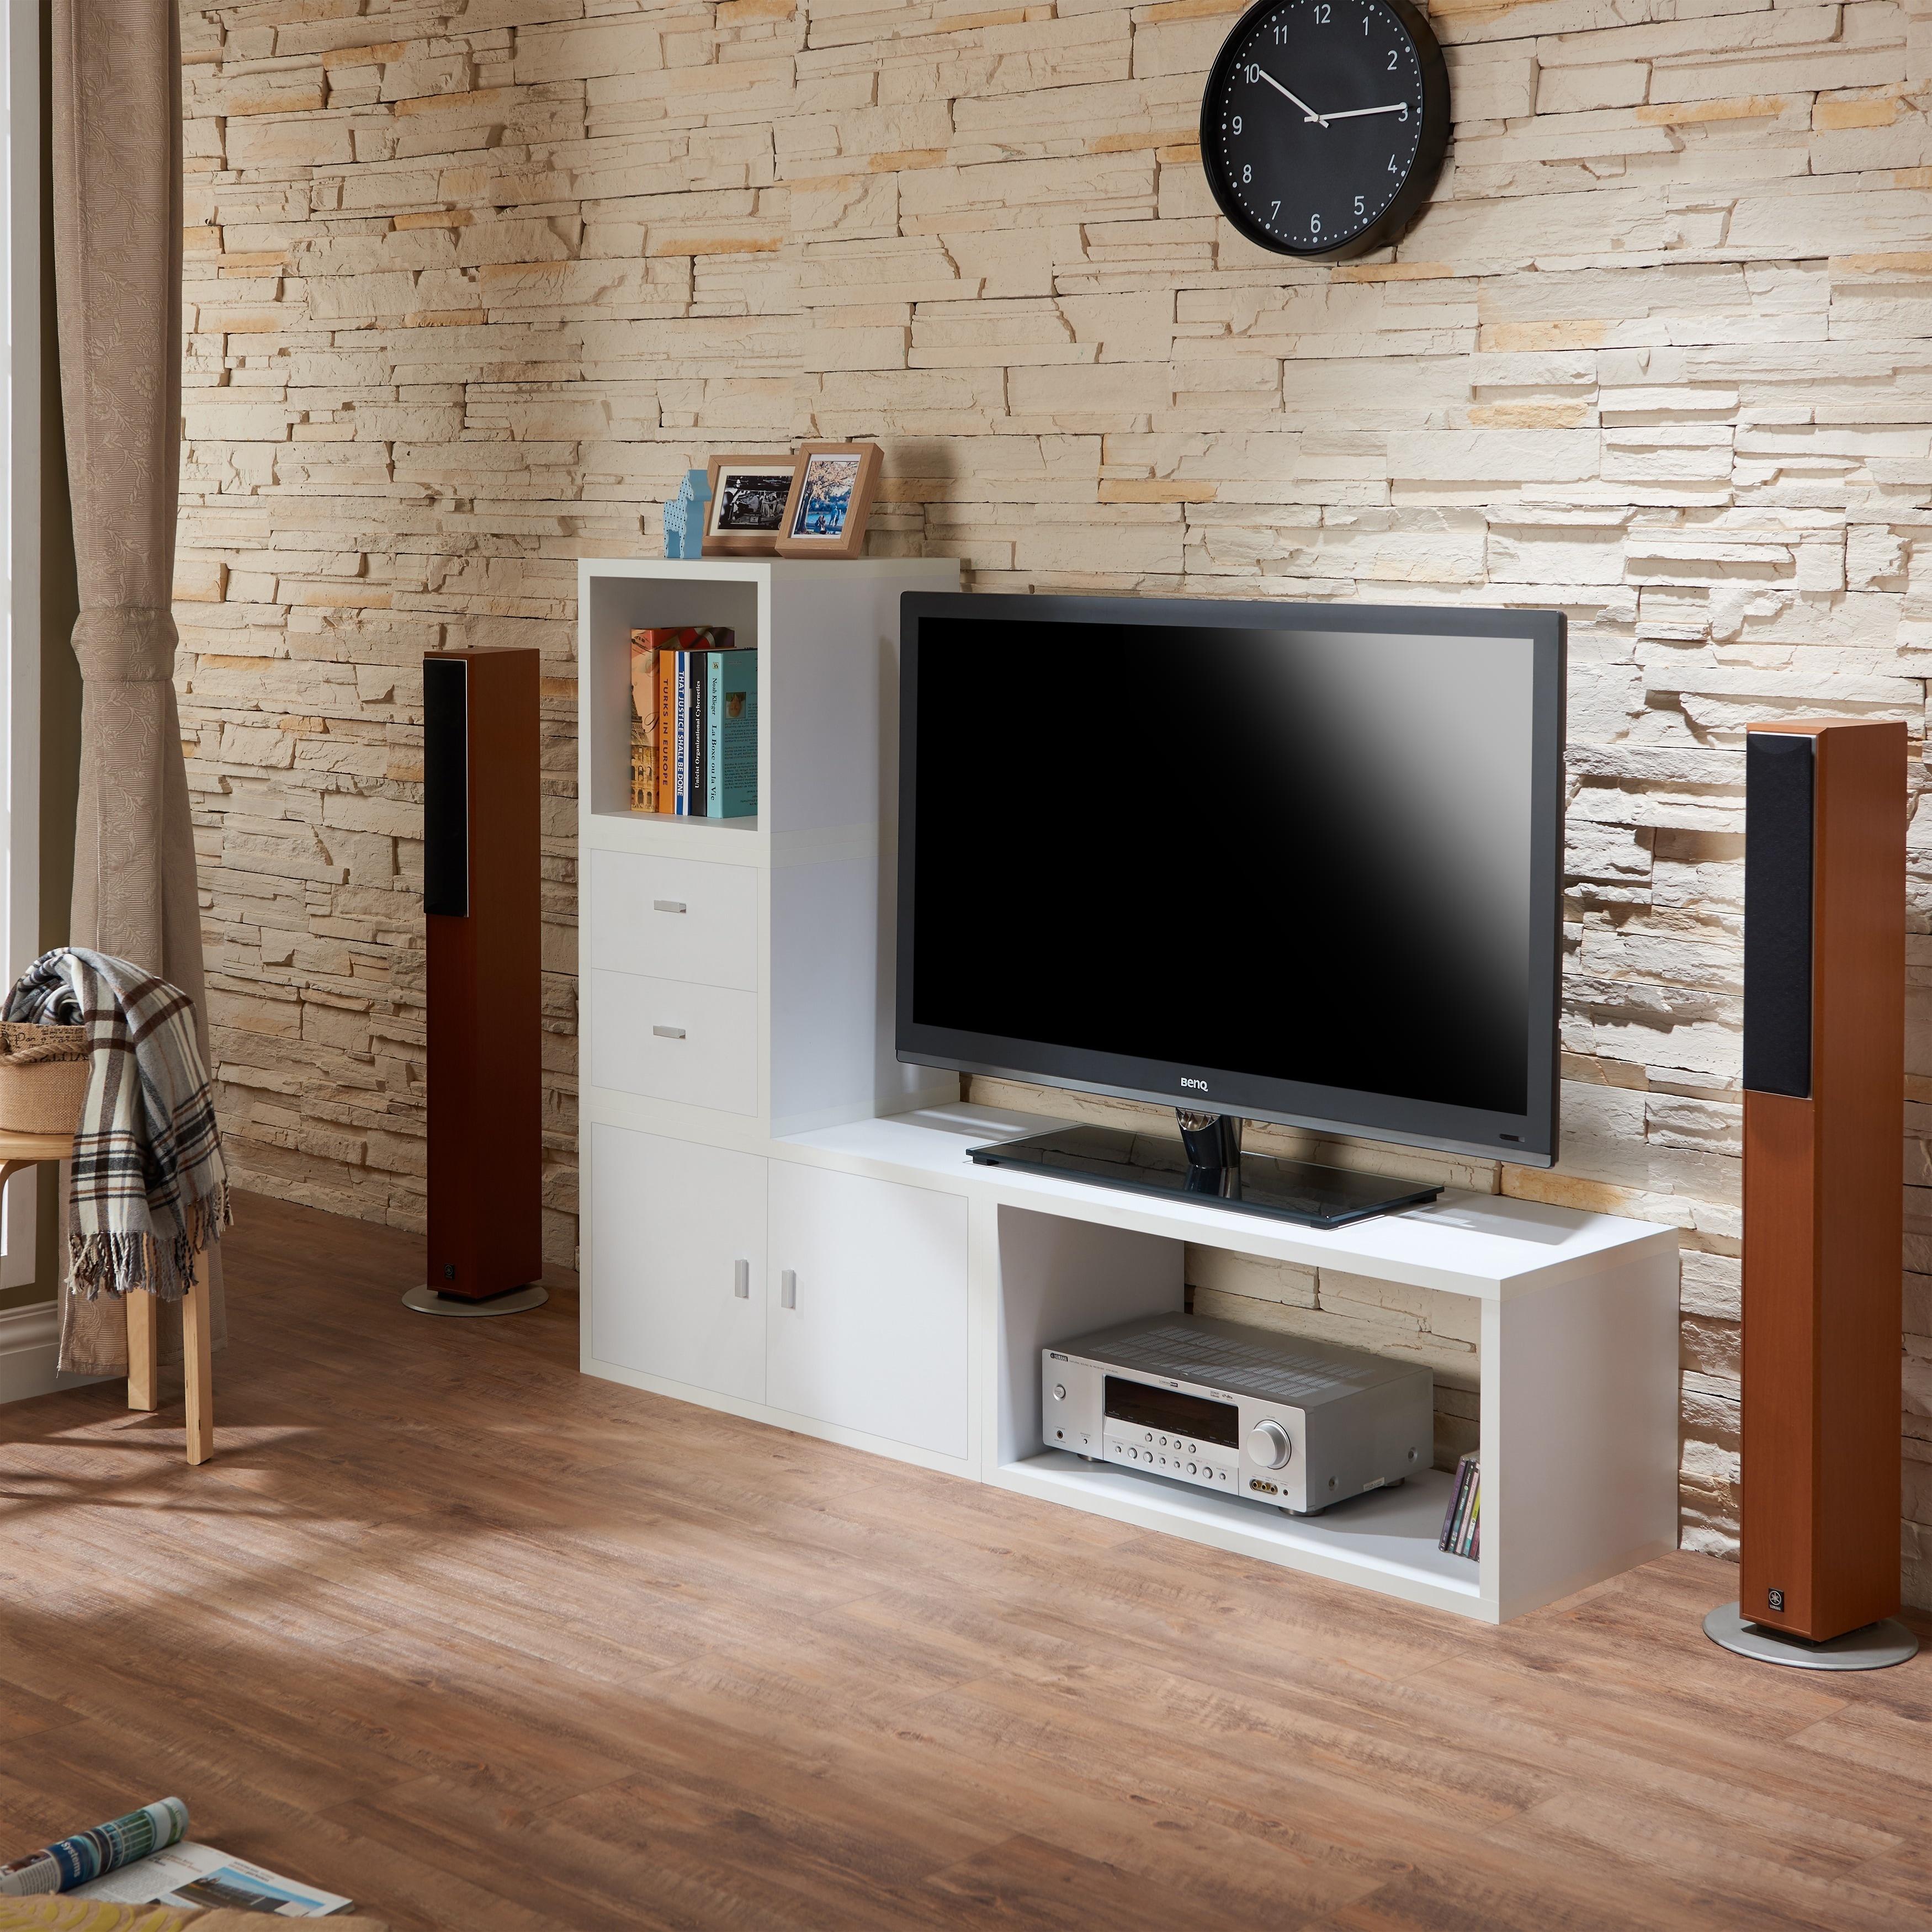 Modular storage furniture best storage design 2017 - The allure of the modular home ...